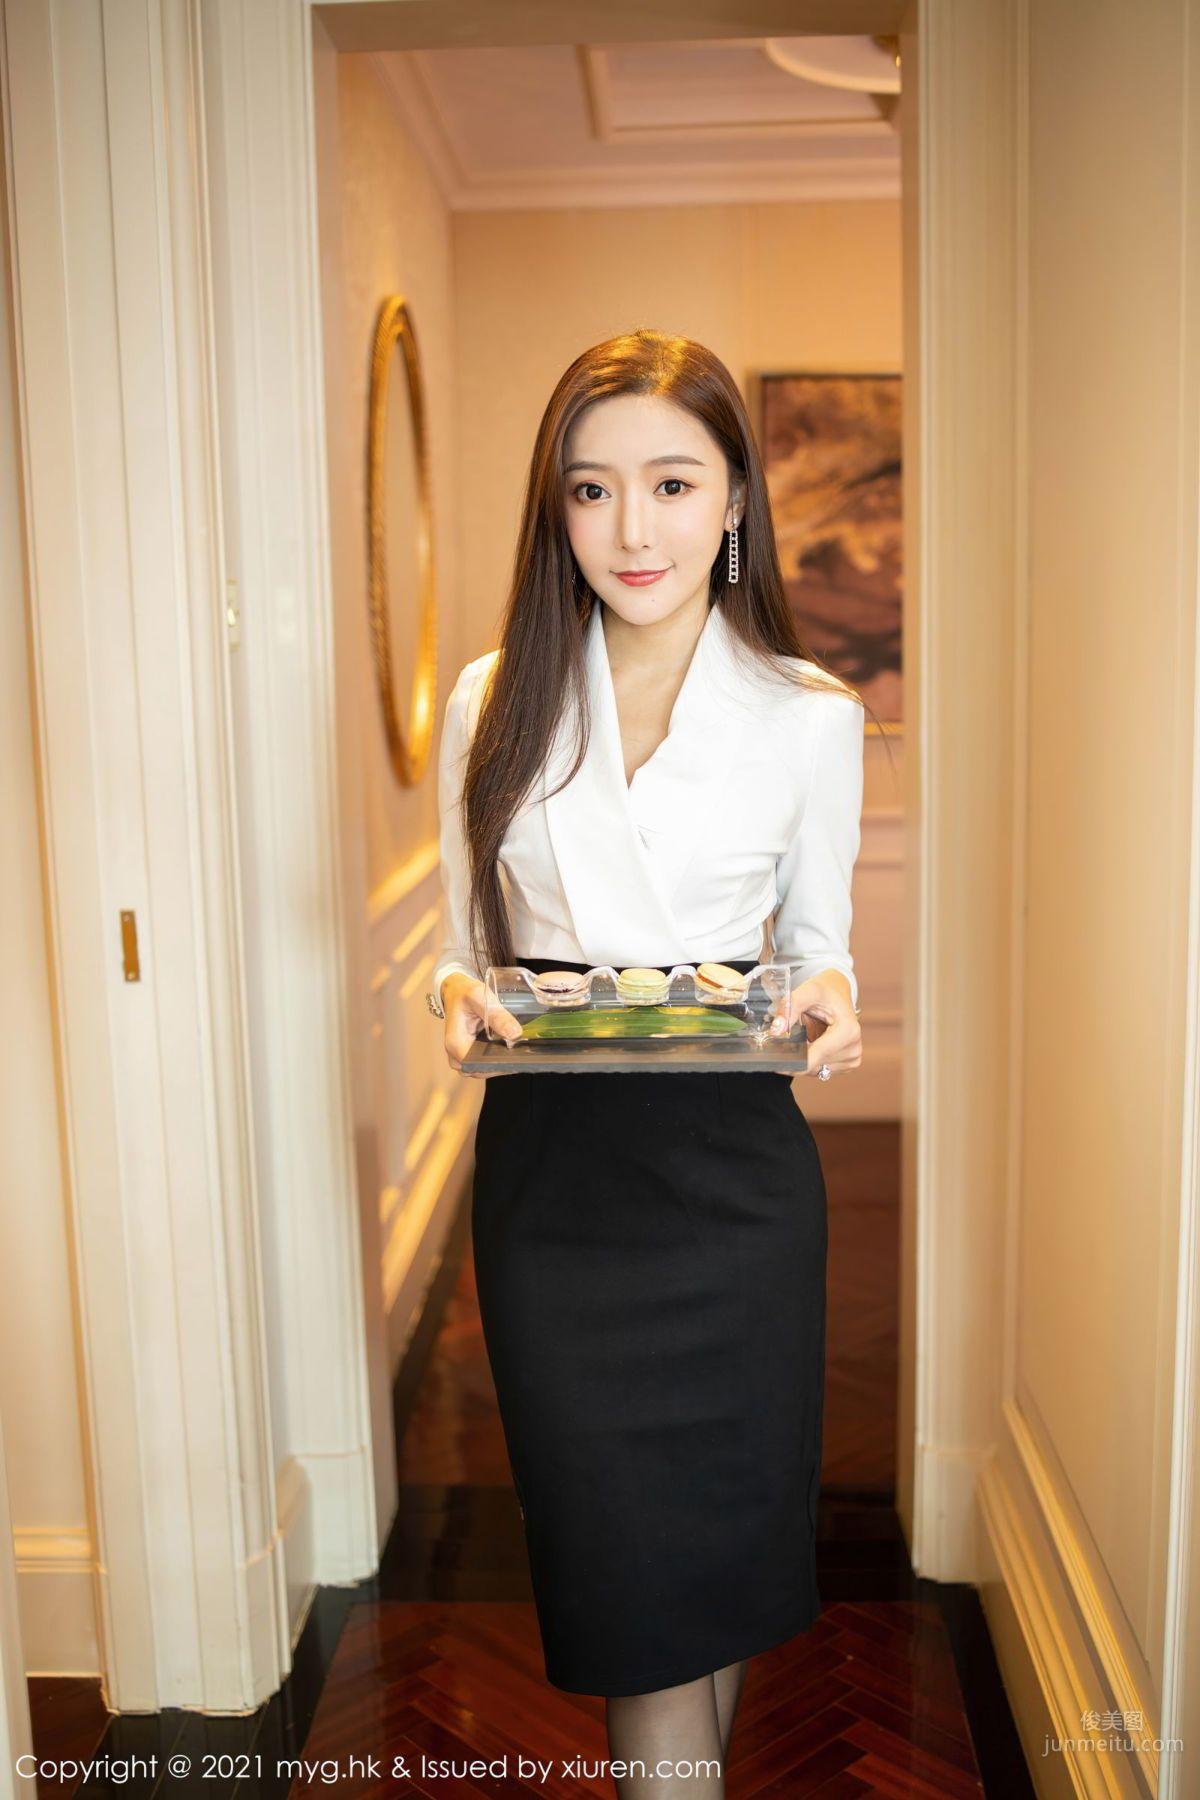 [MyGirl] 2021.02.23 VOL.492 王馨瑶yanni_0